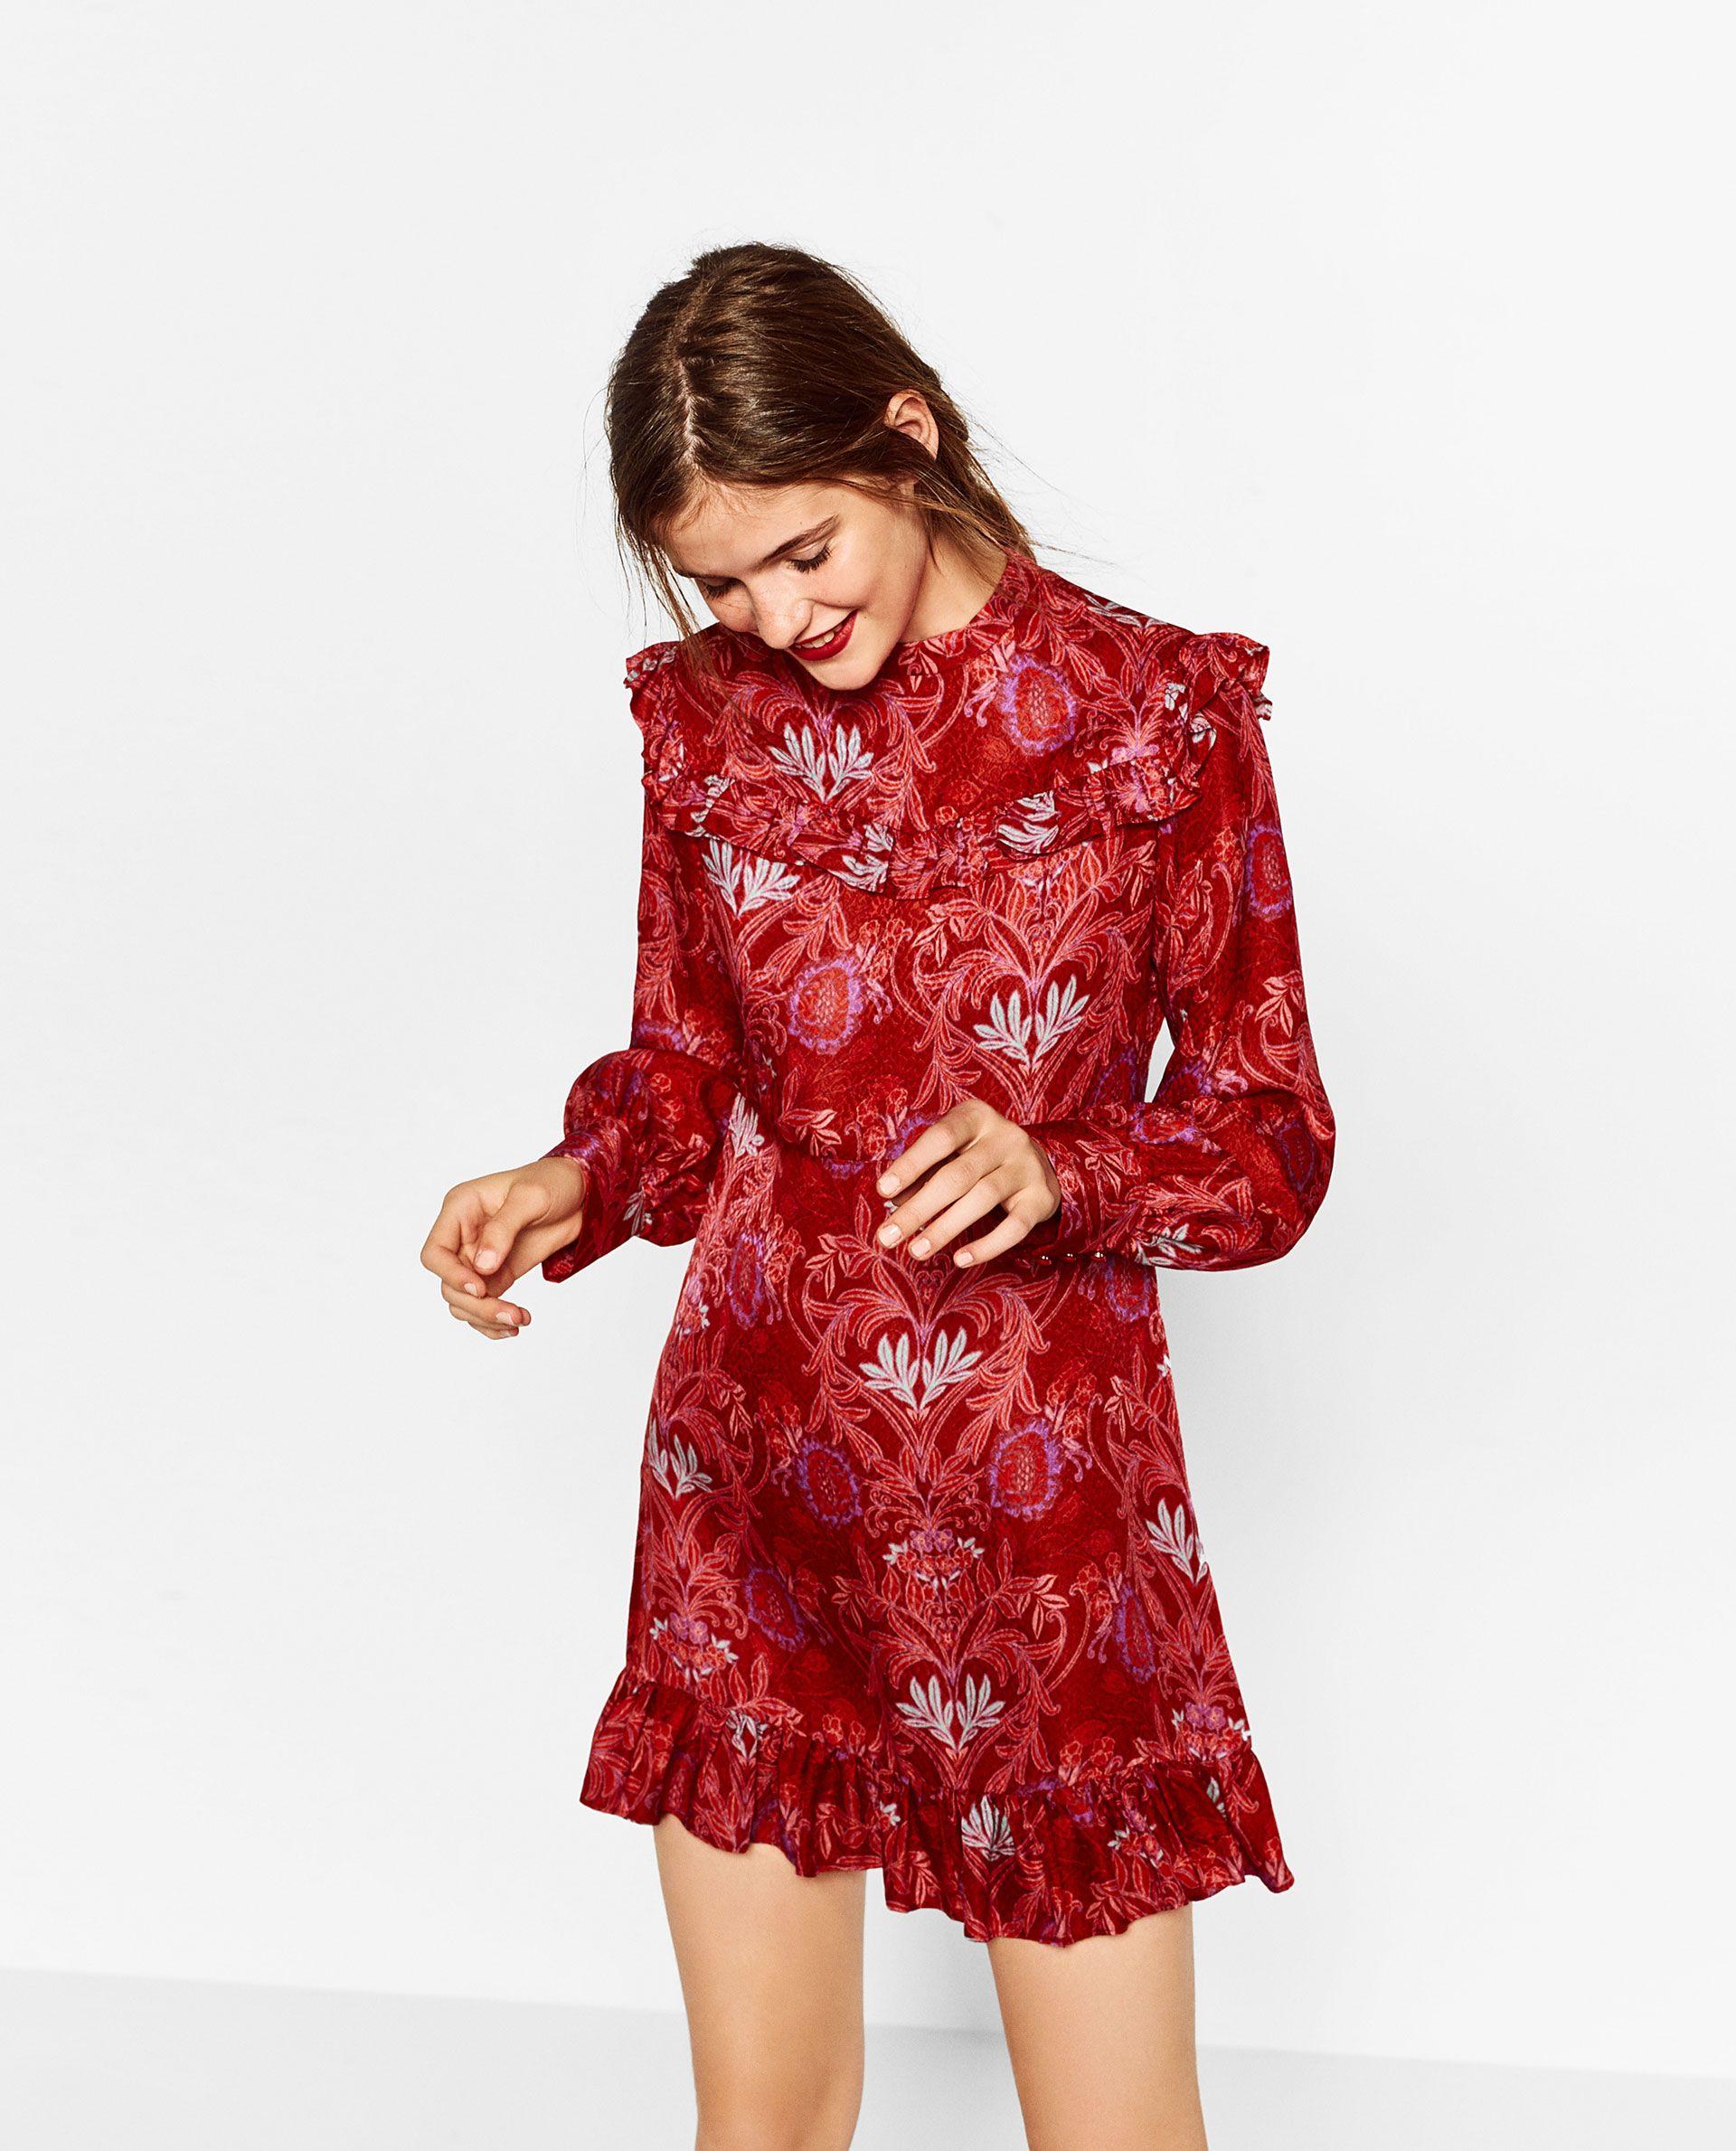 b8f428c18236 ZARA - MULHER - VESTIDO CURTO JACQUARD | Moda | Vestidos, Zara e ...